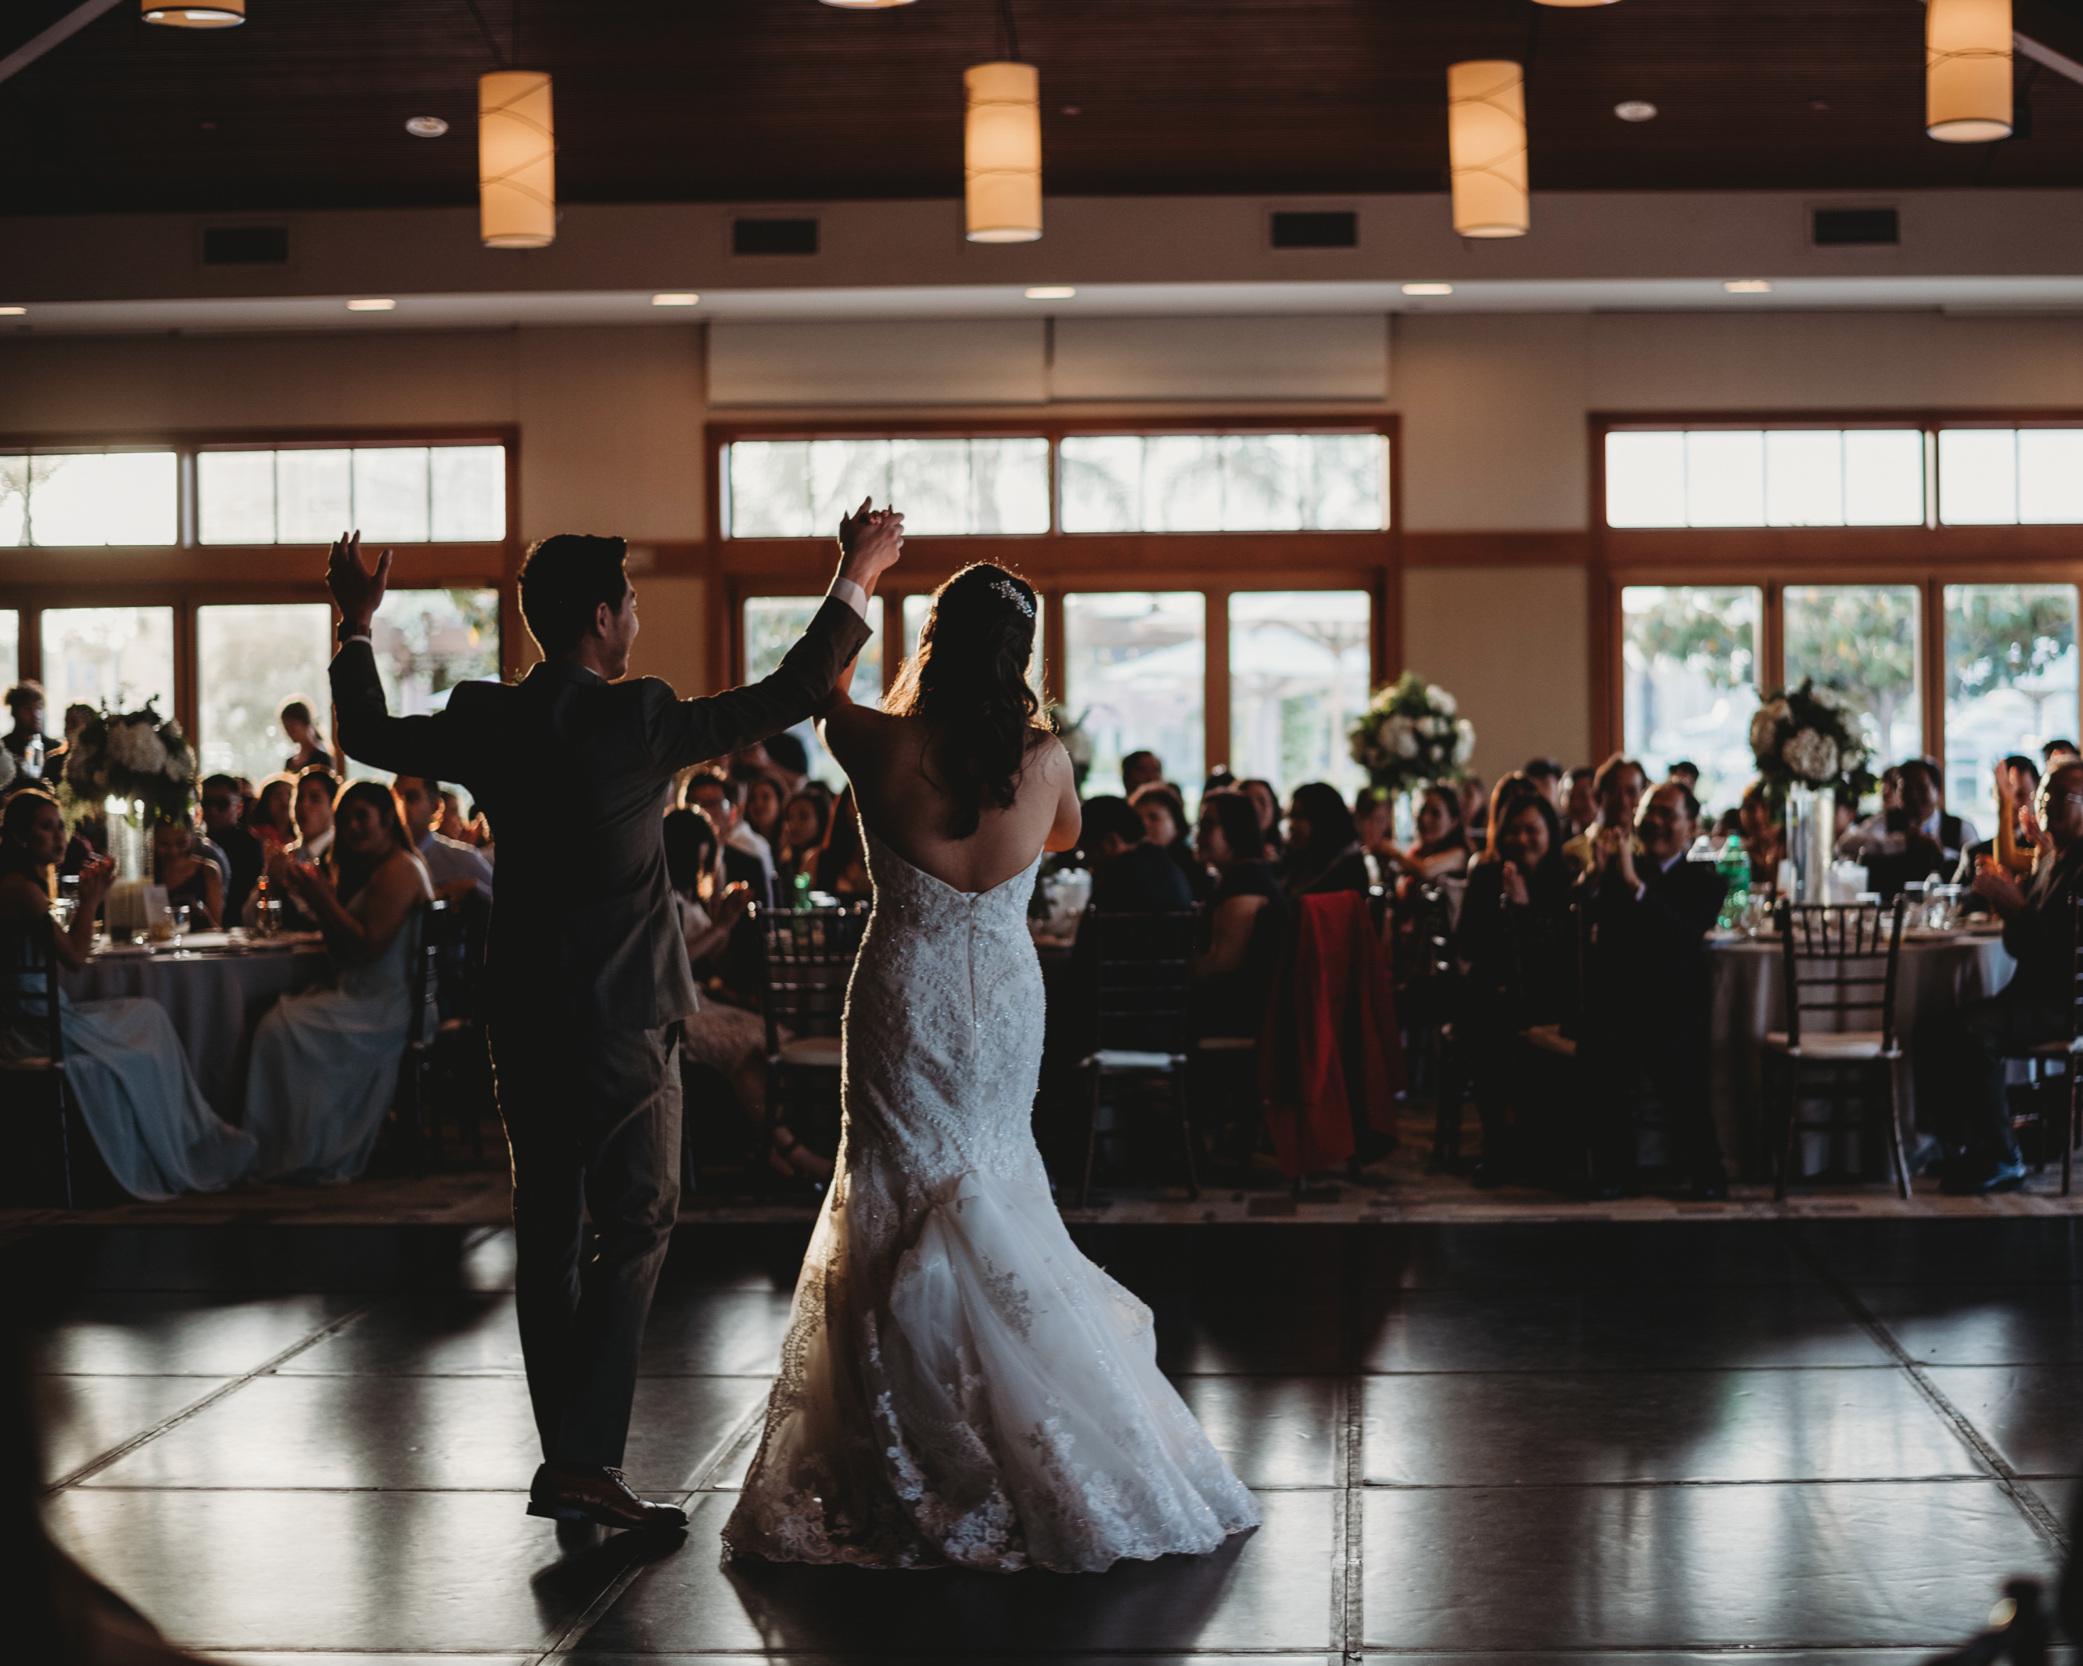 wedding_coronado_community_center-36.jpg